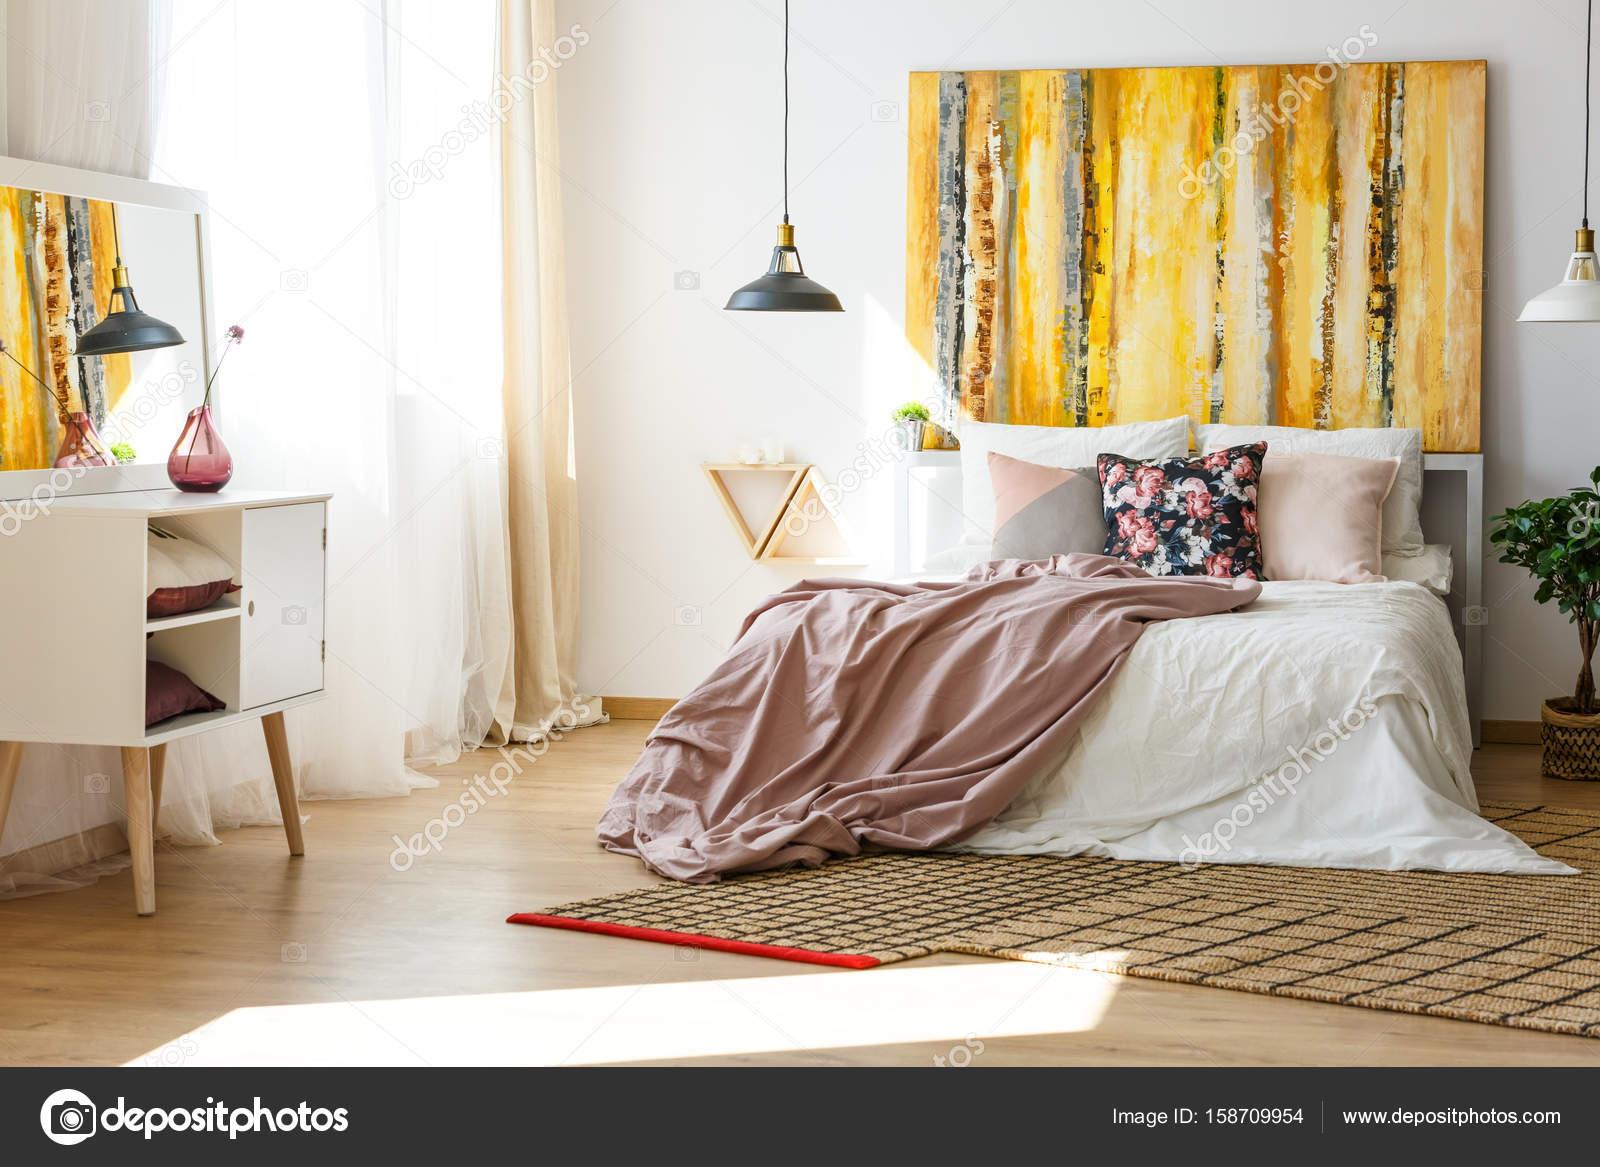 Slaapkamer Warme Kleuren : Slaapkamer in warme kleuren u2014 stockfoto © photographee.eu #158709954